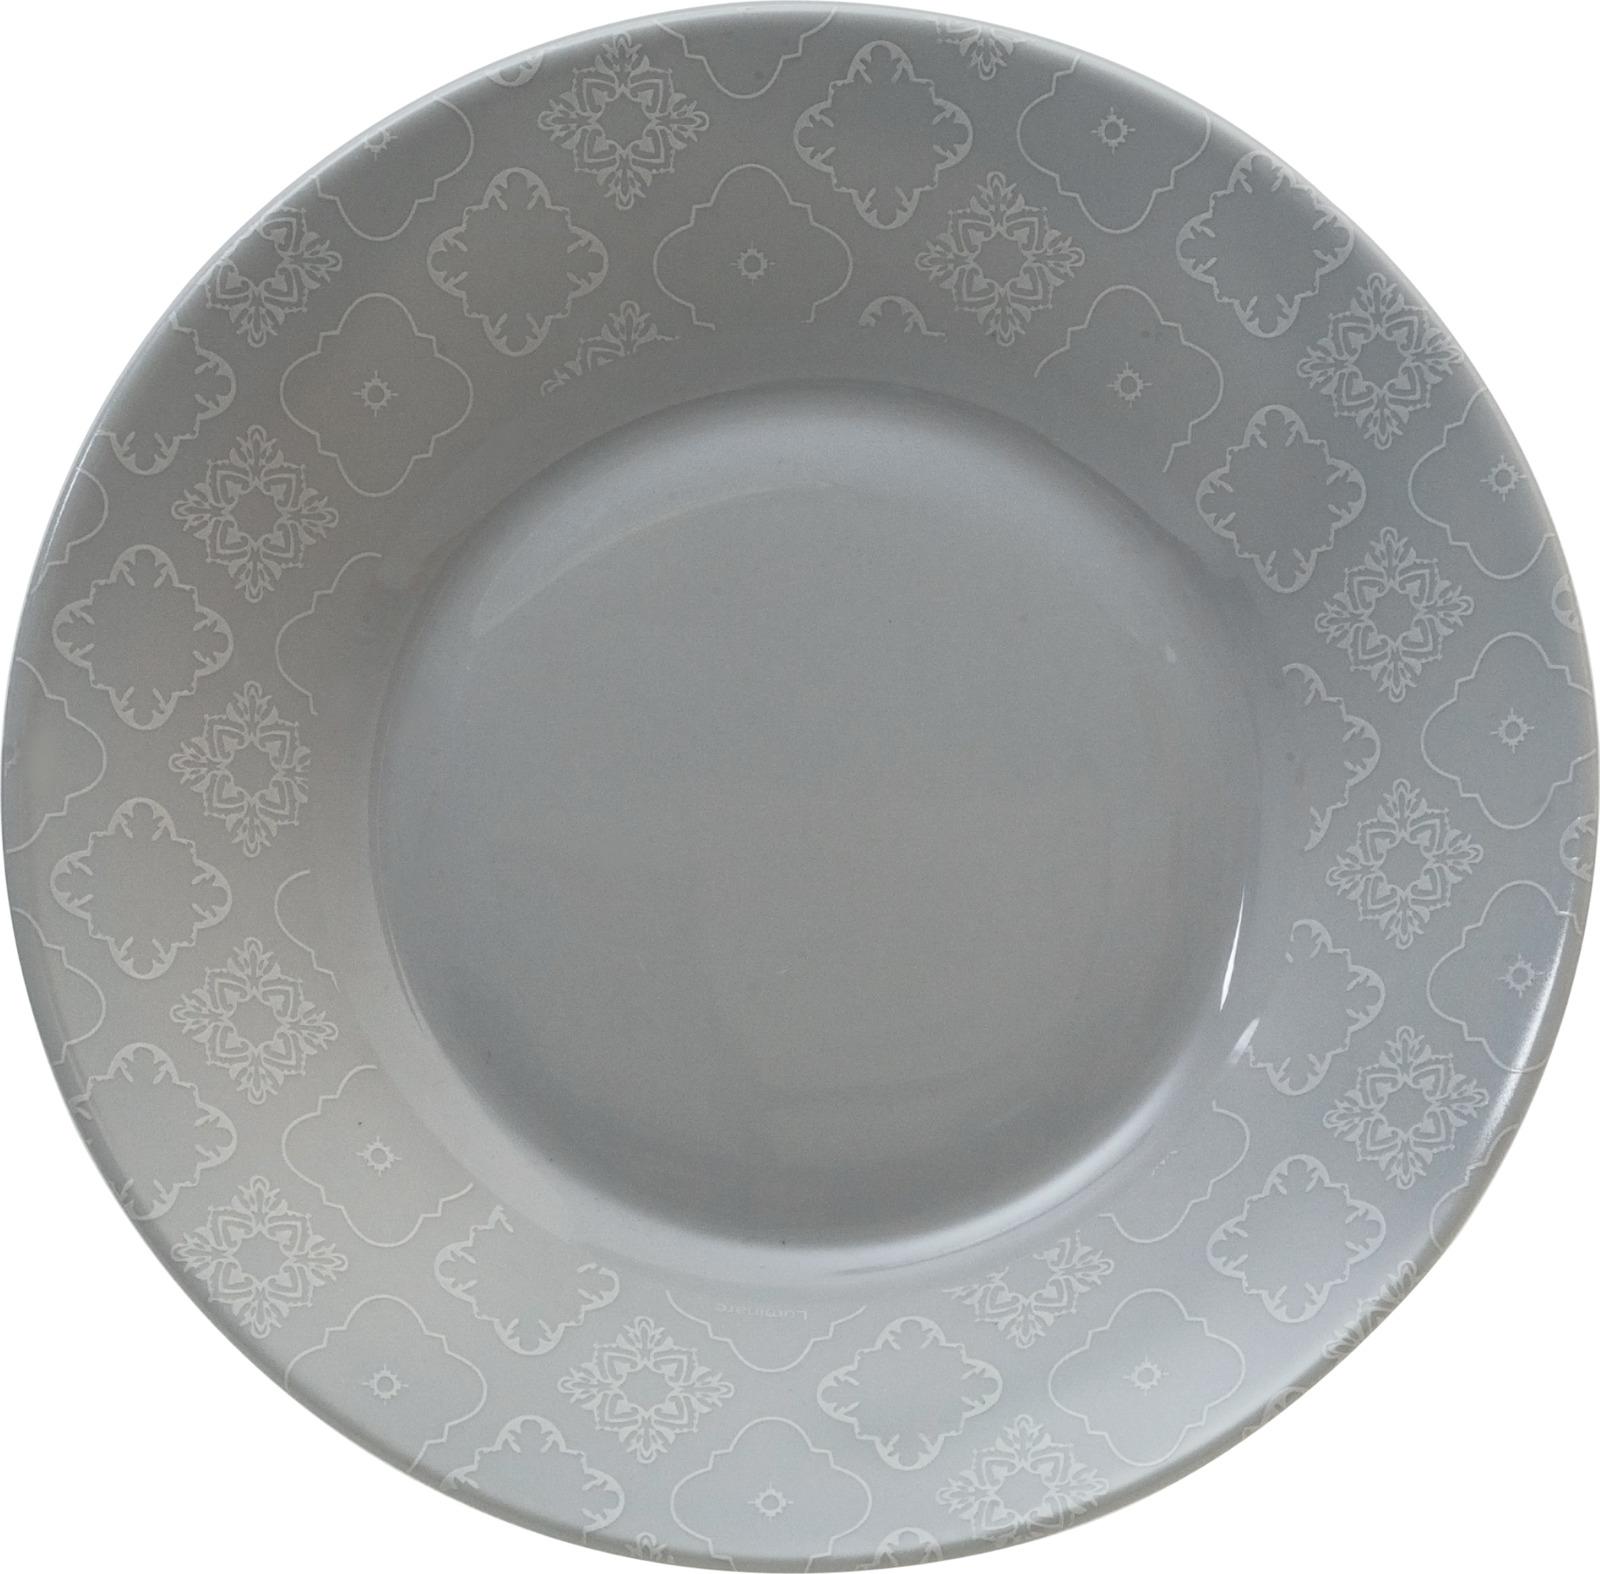 Тарелка глубокая Luminarc Калико, L8371, белый, диаметр 23 см тарелка глубокая luminarc ализэ перл n4836 белый диаметр 23 см